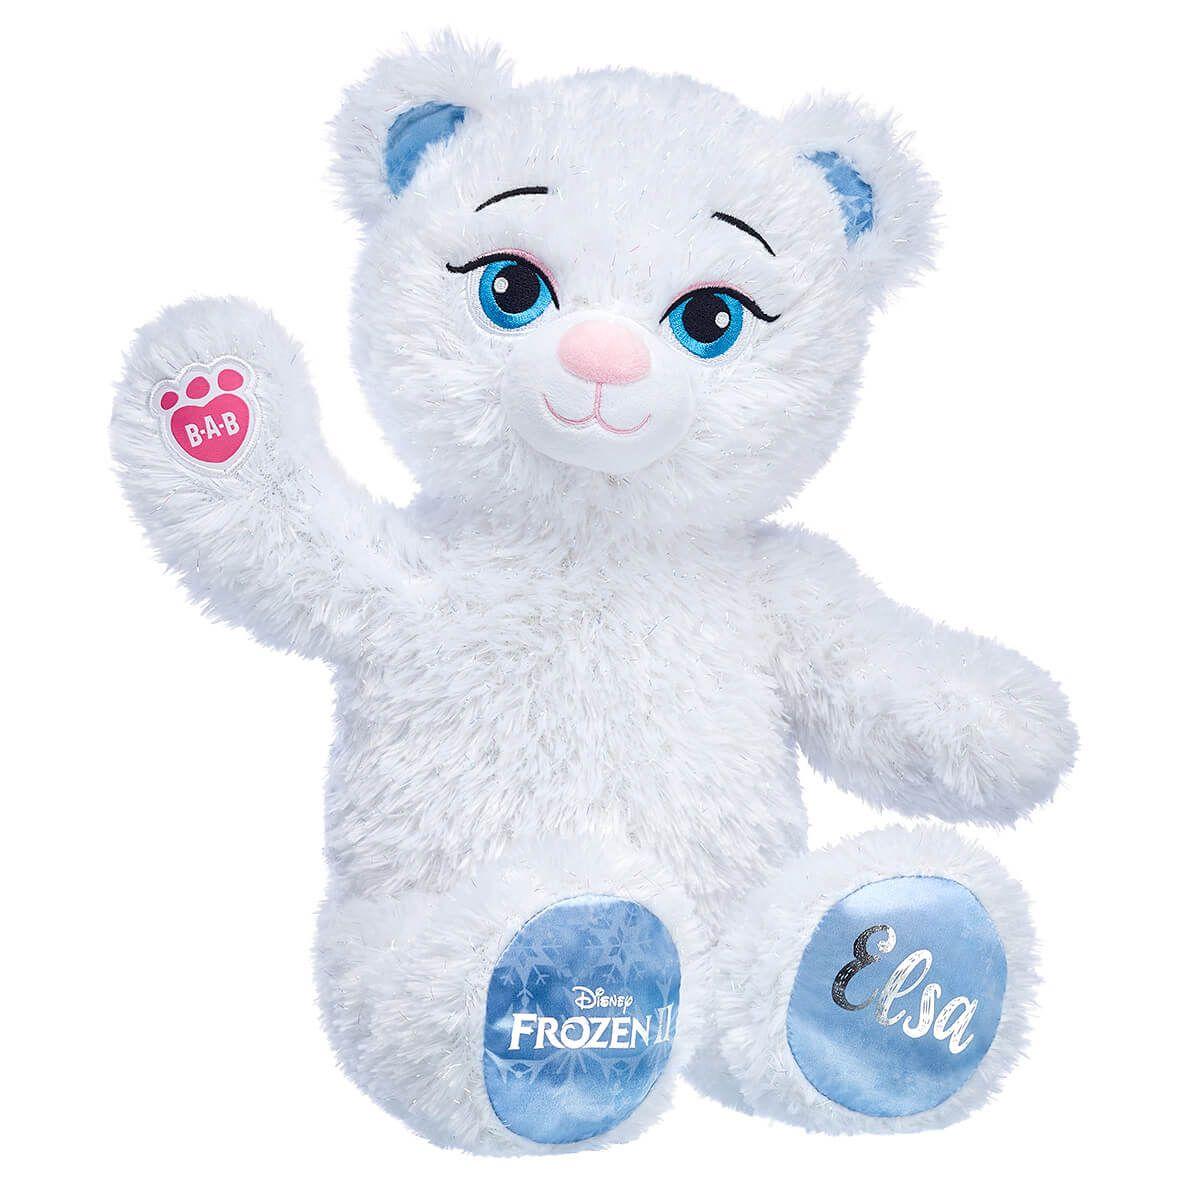 Disney Frozen 2 Elsa Inspired Bear Pet Gifts Cute Stuffed